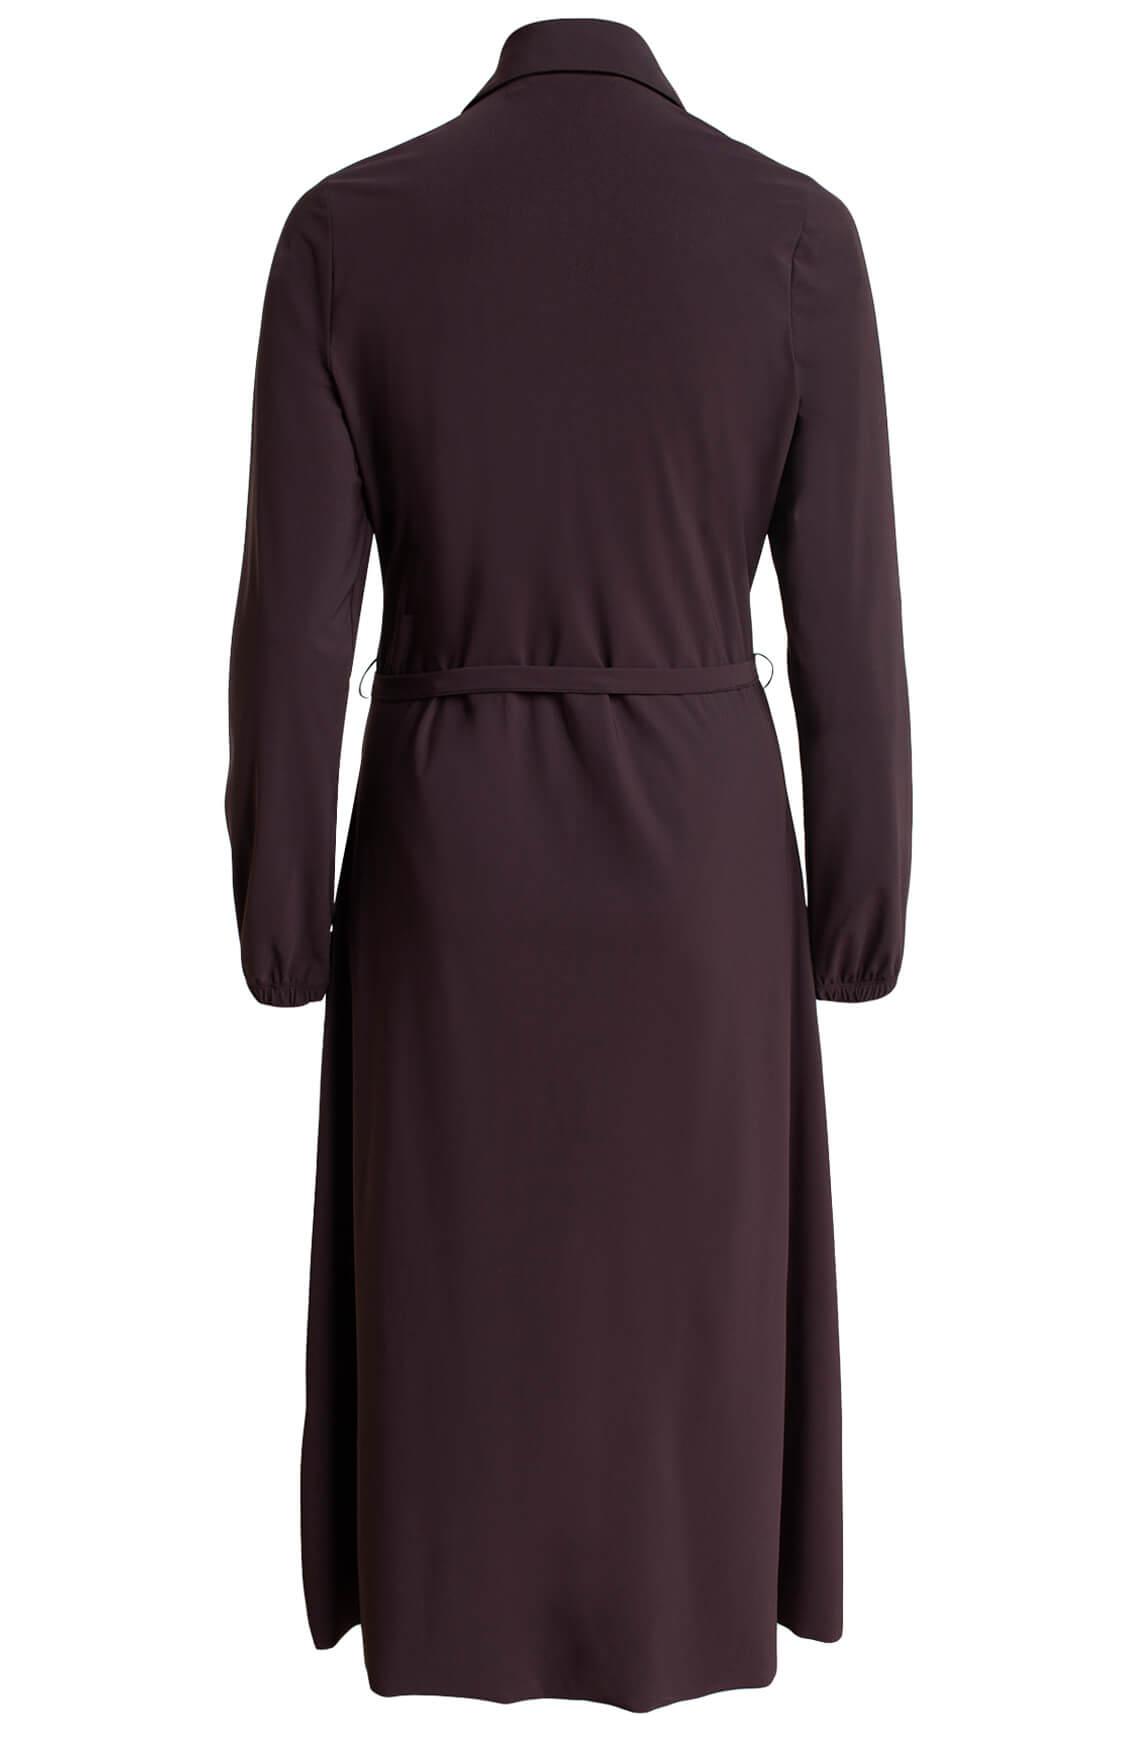 Moscow Dames Nika jurk Bruin